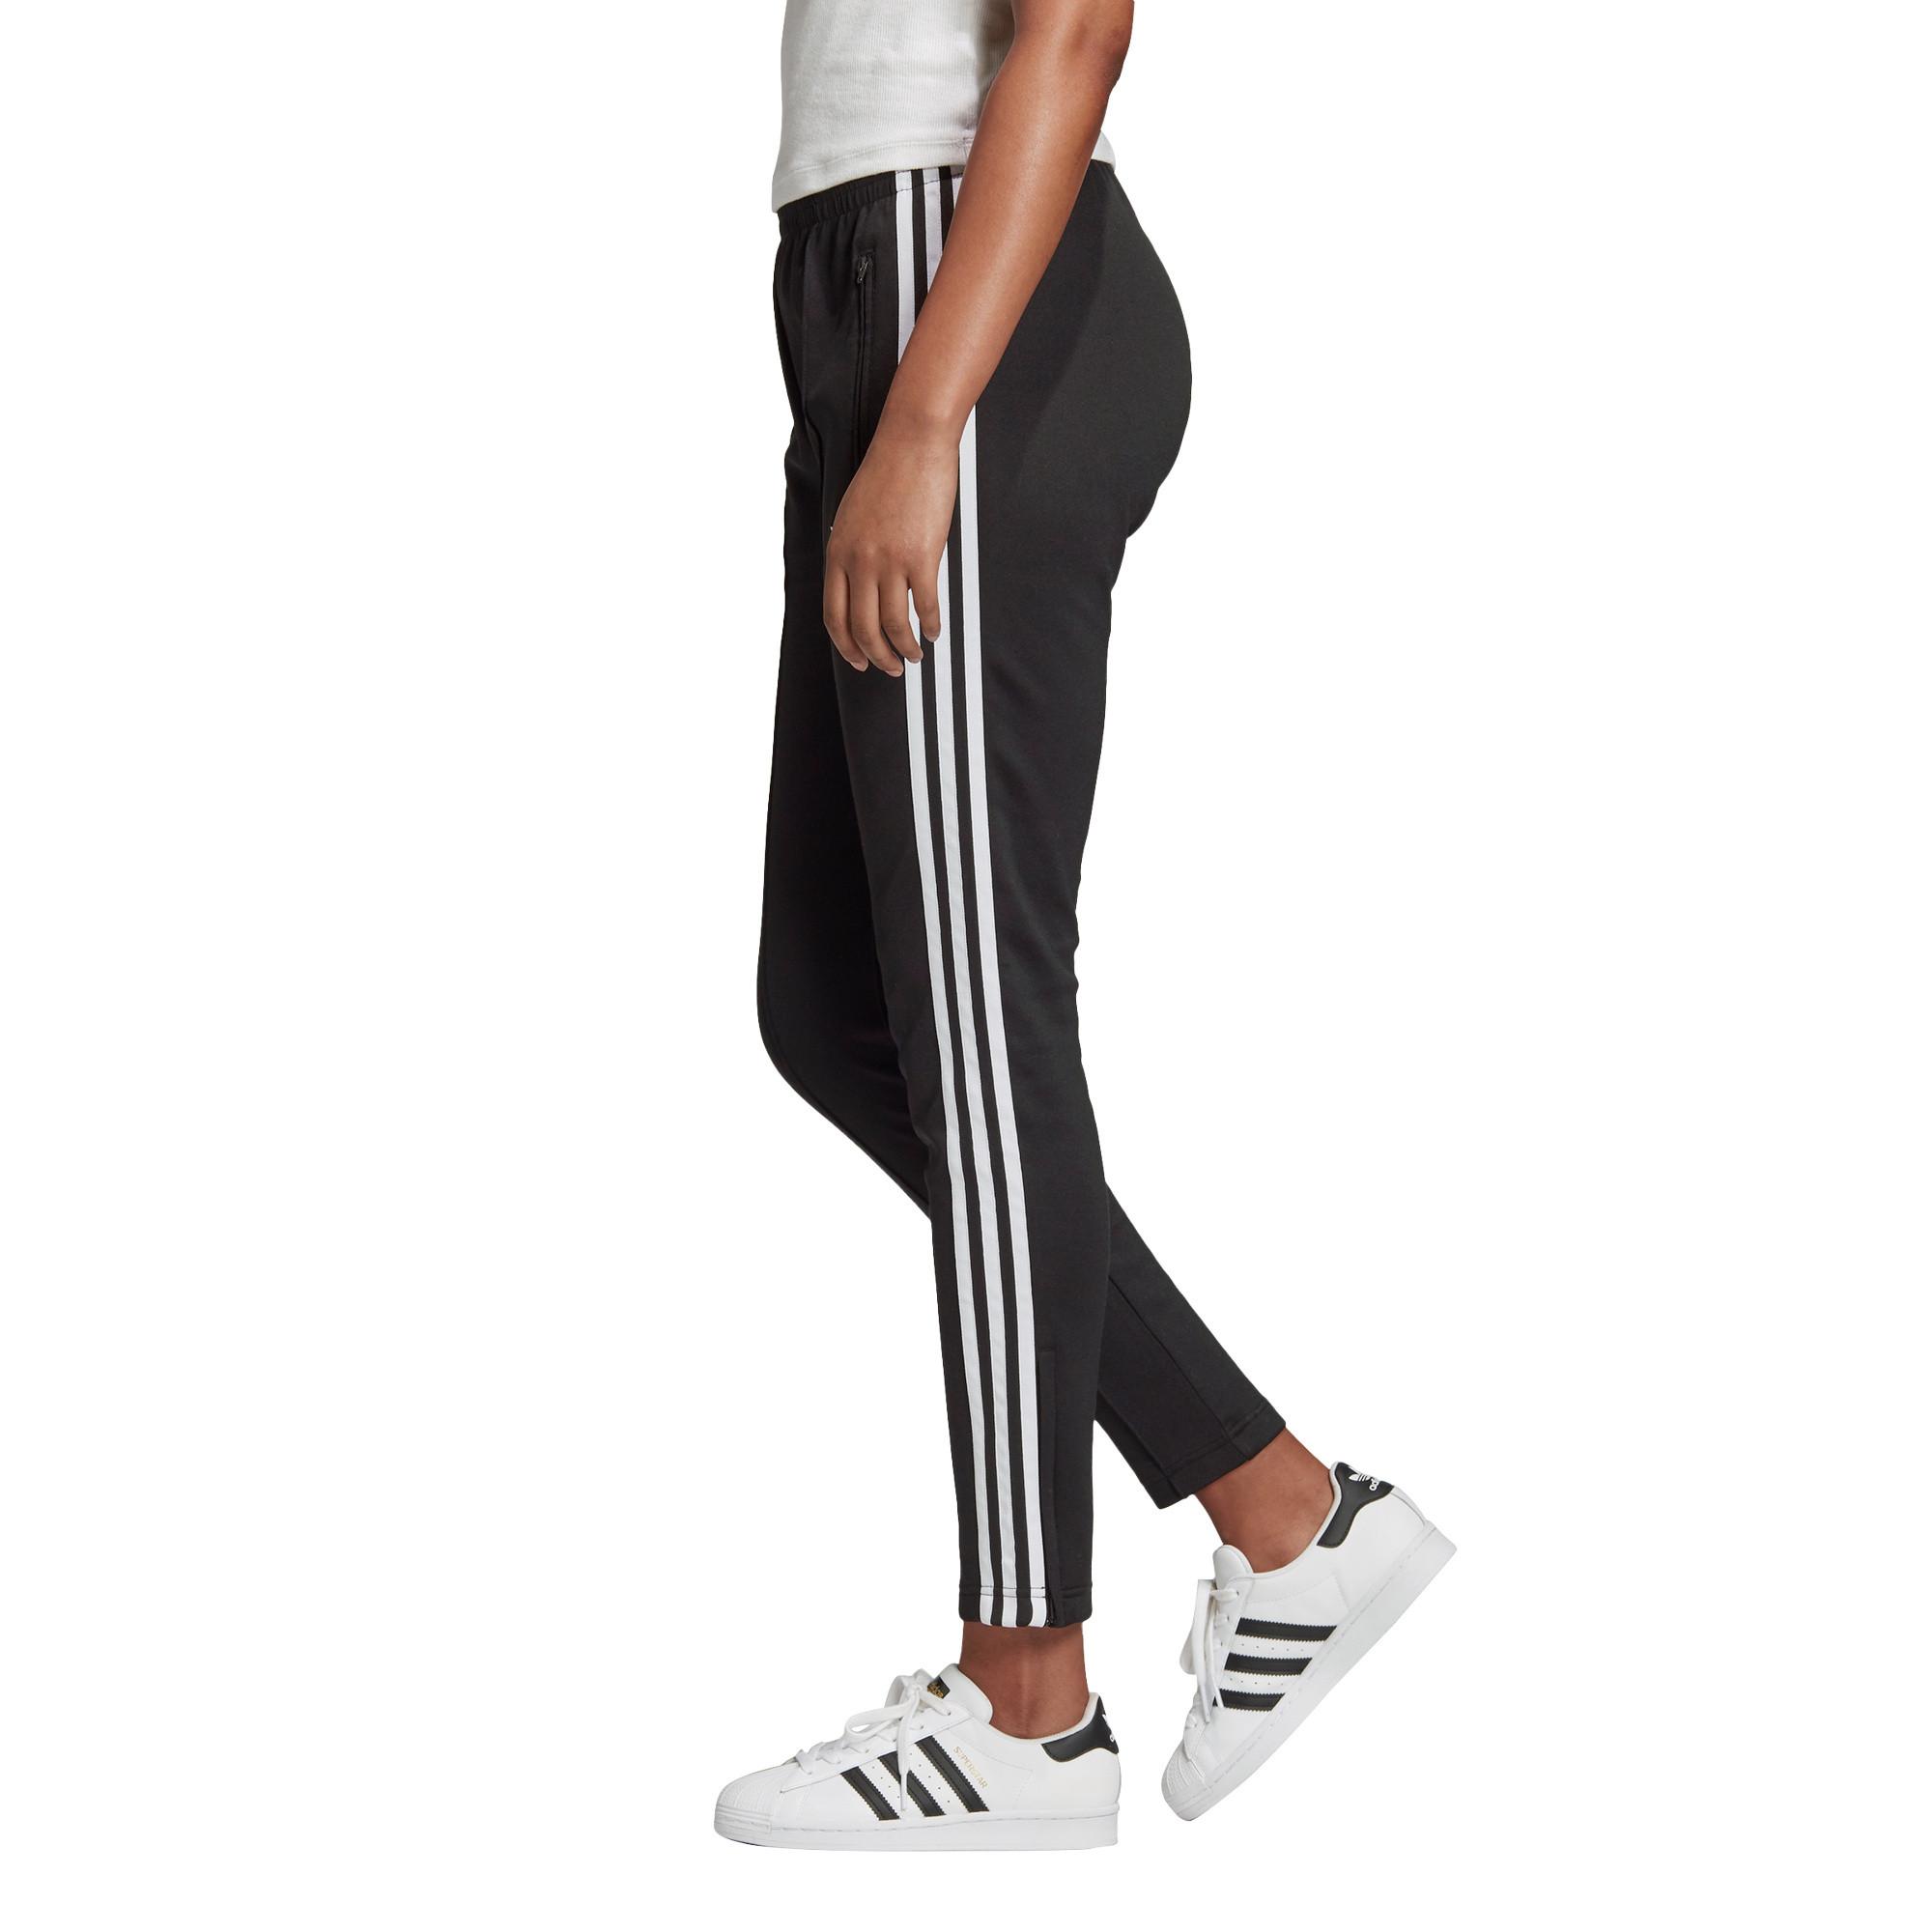 Pantaloni tuta Primeblue SST, Bianco/Nero, large image number 6